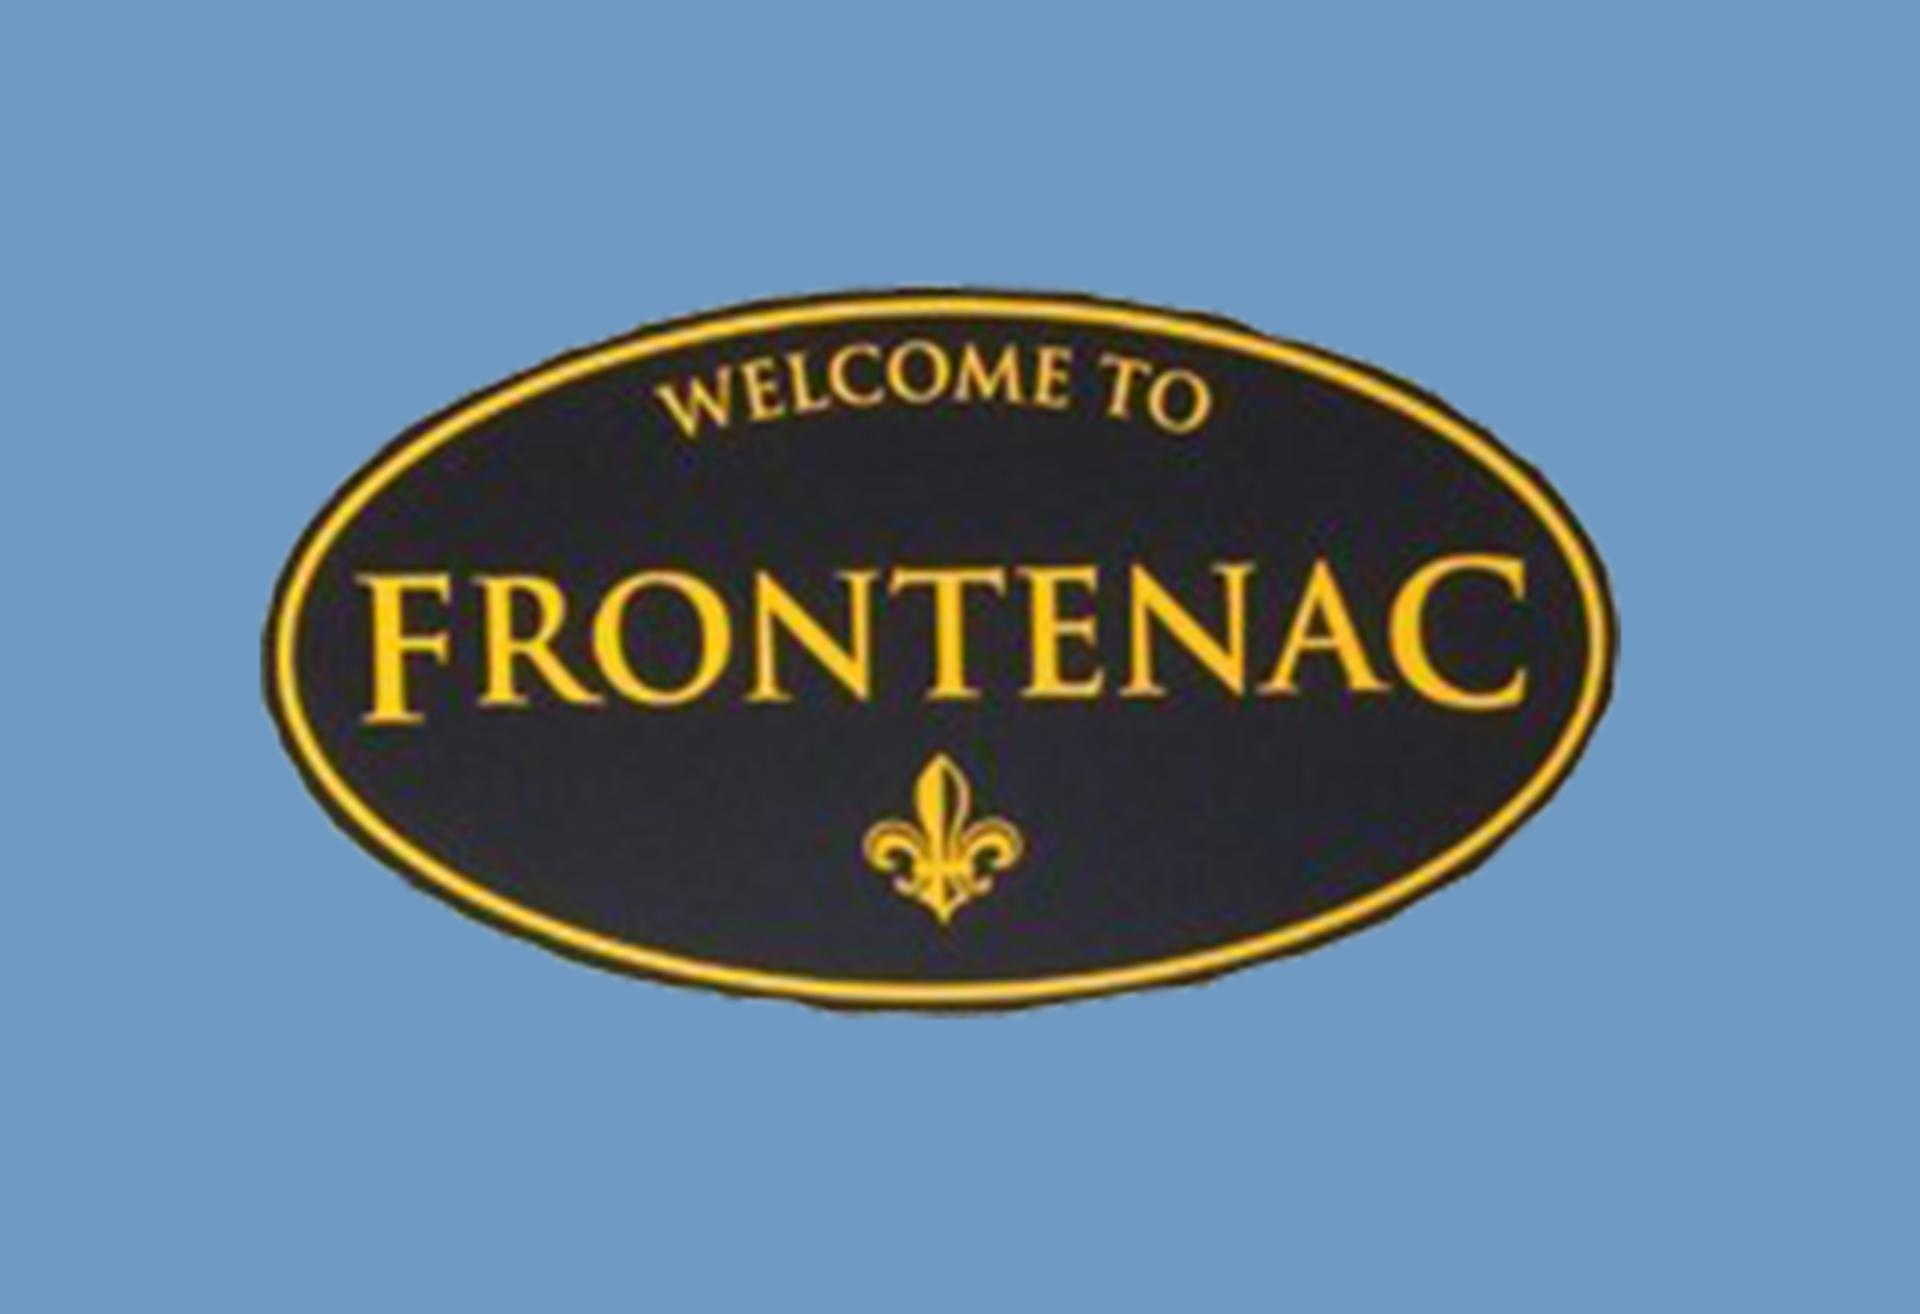 Frontenac Real Estate